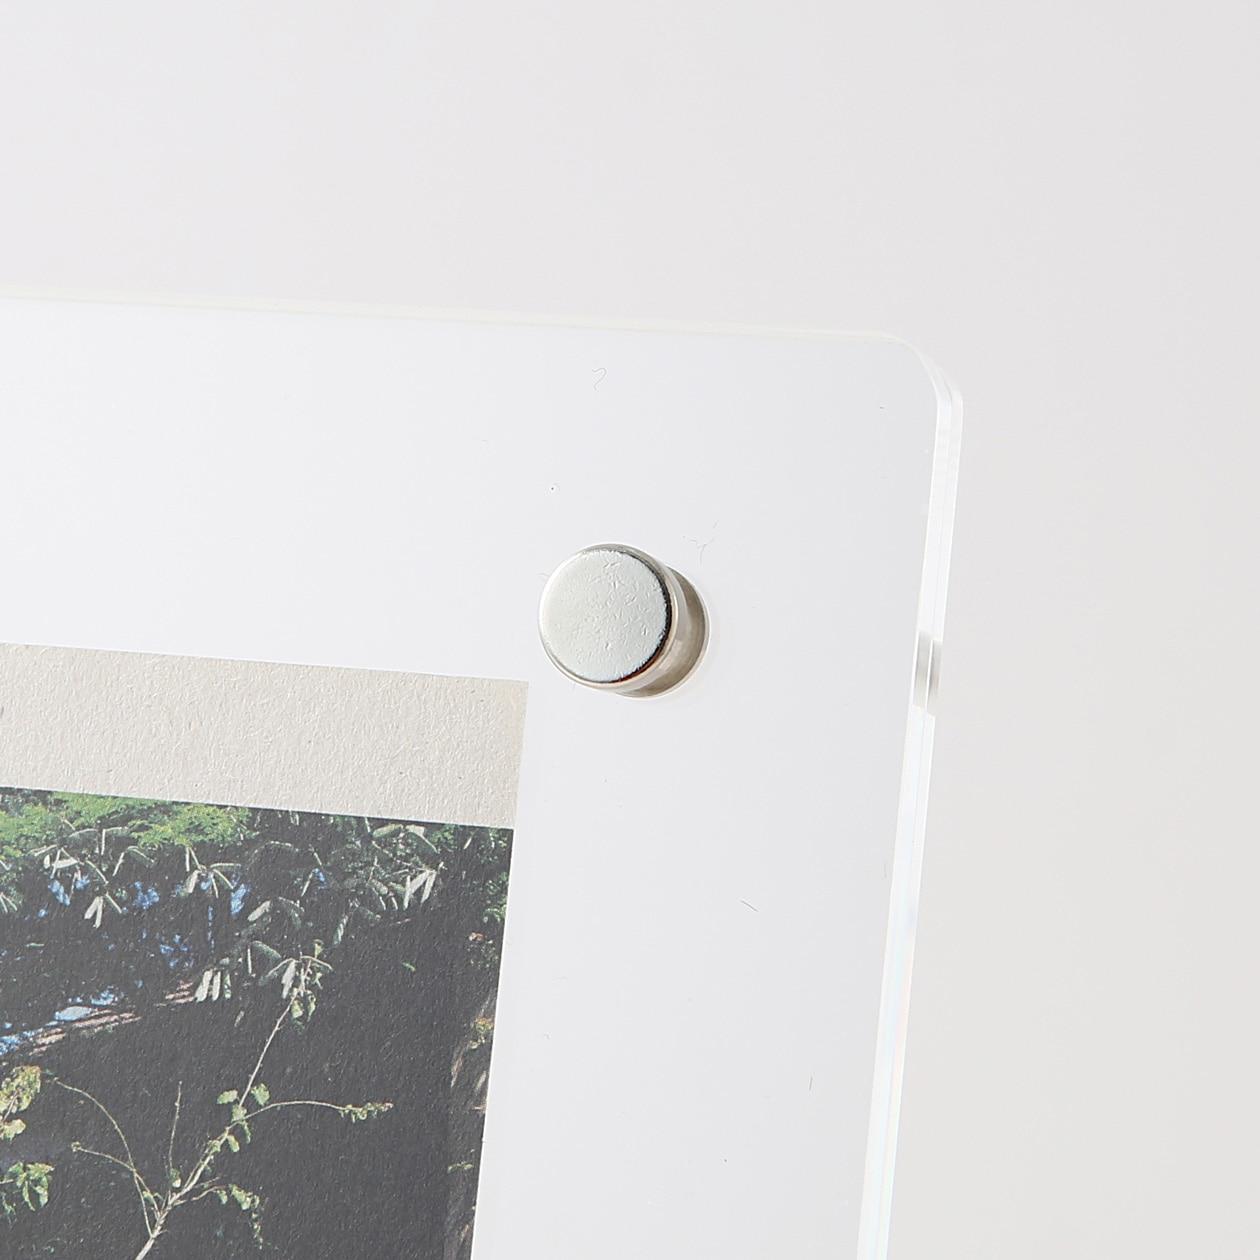 Acrylic Frame With Steel Legs | 無印良品 MUJI